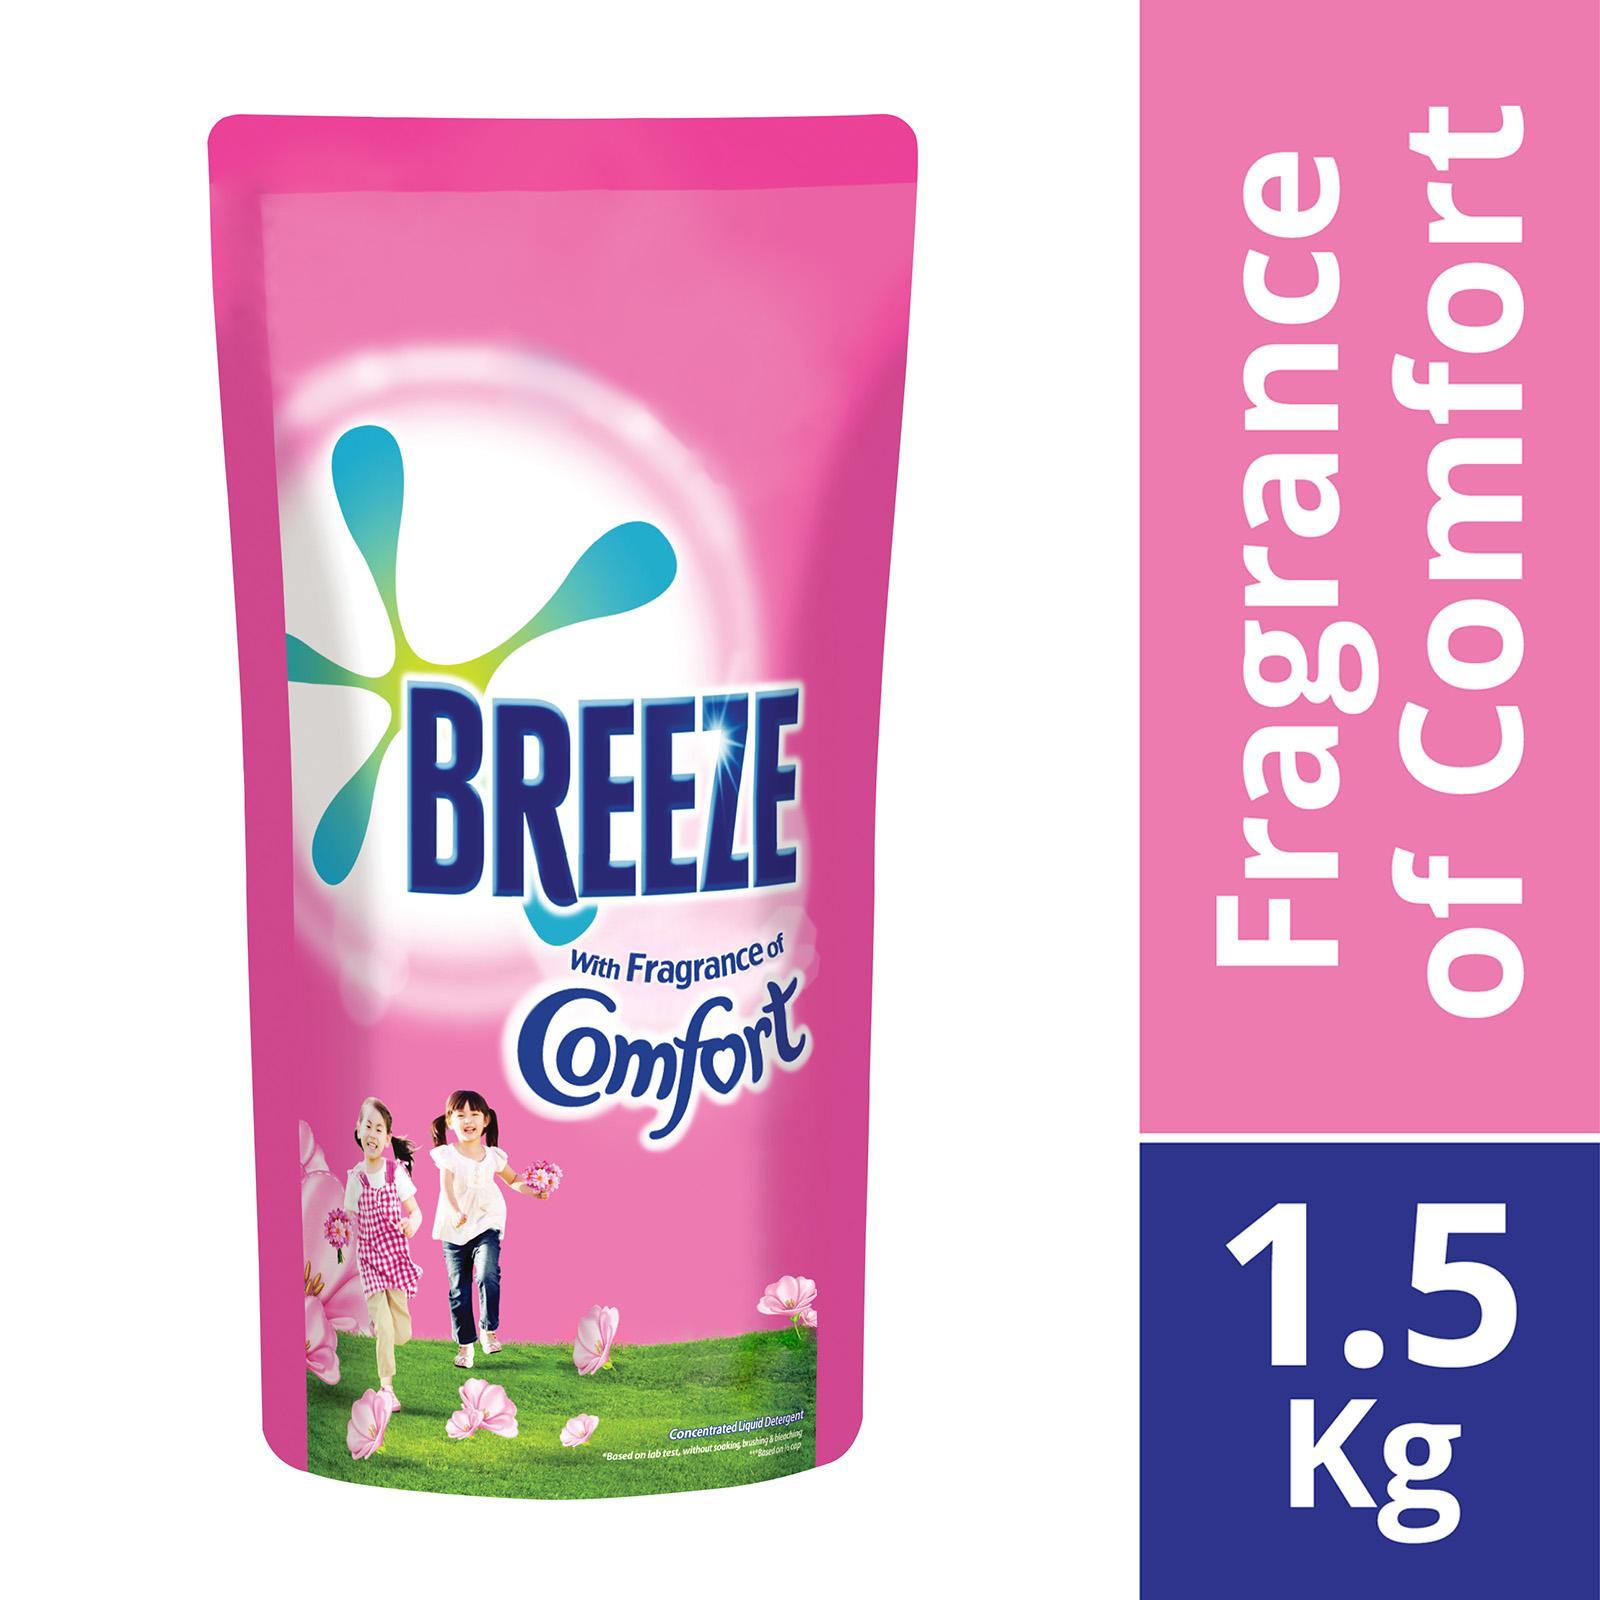 Breeze Liquid Detergent With Fragrance Of Comfort Refill